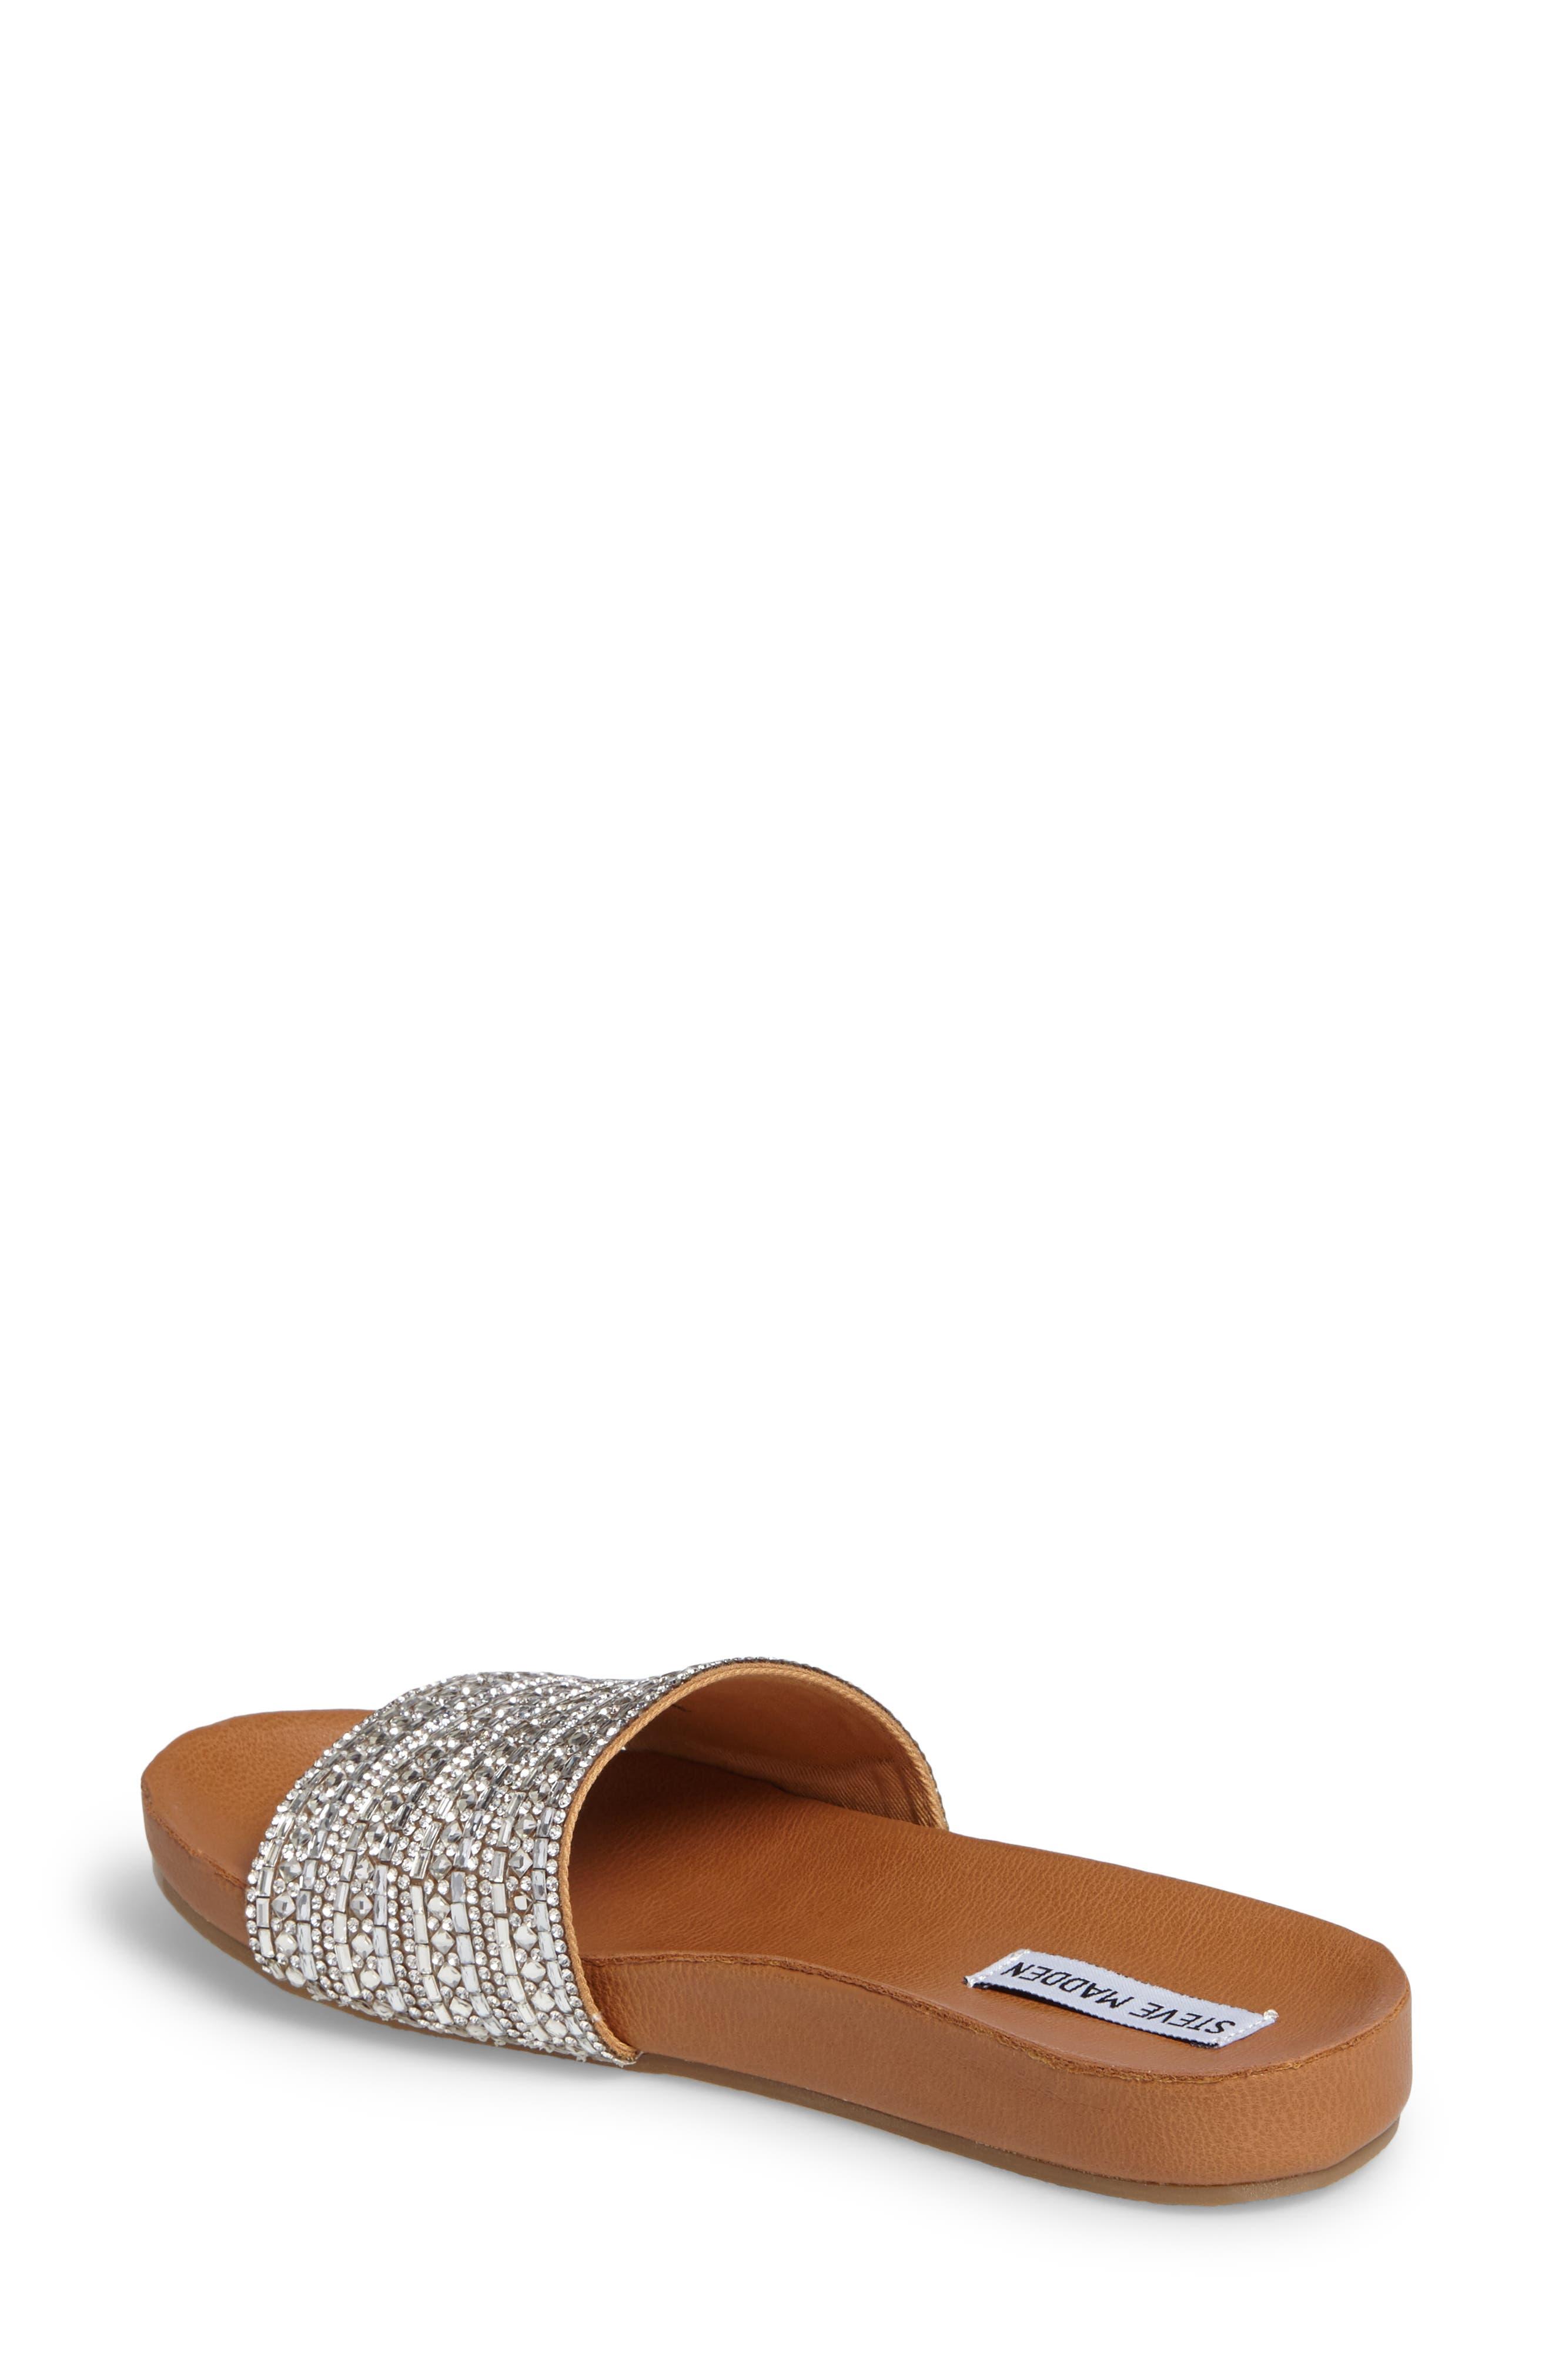 Dazzle Embellished Slide Sandal,                             Alternate thumbnail 2, color,                             Rhinestone